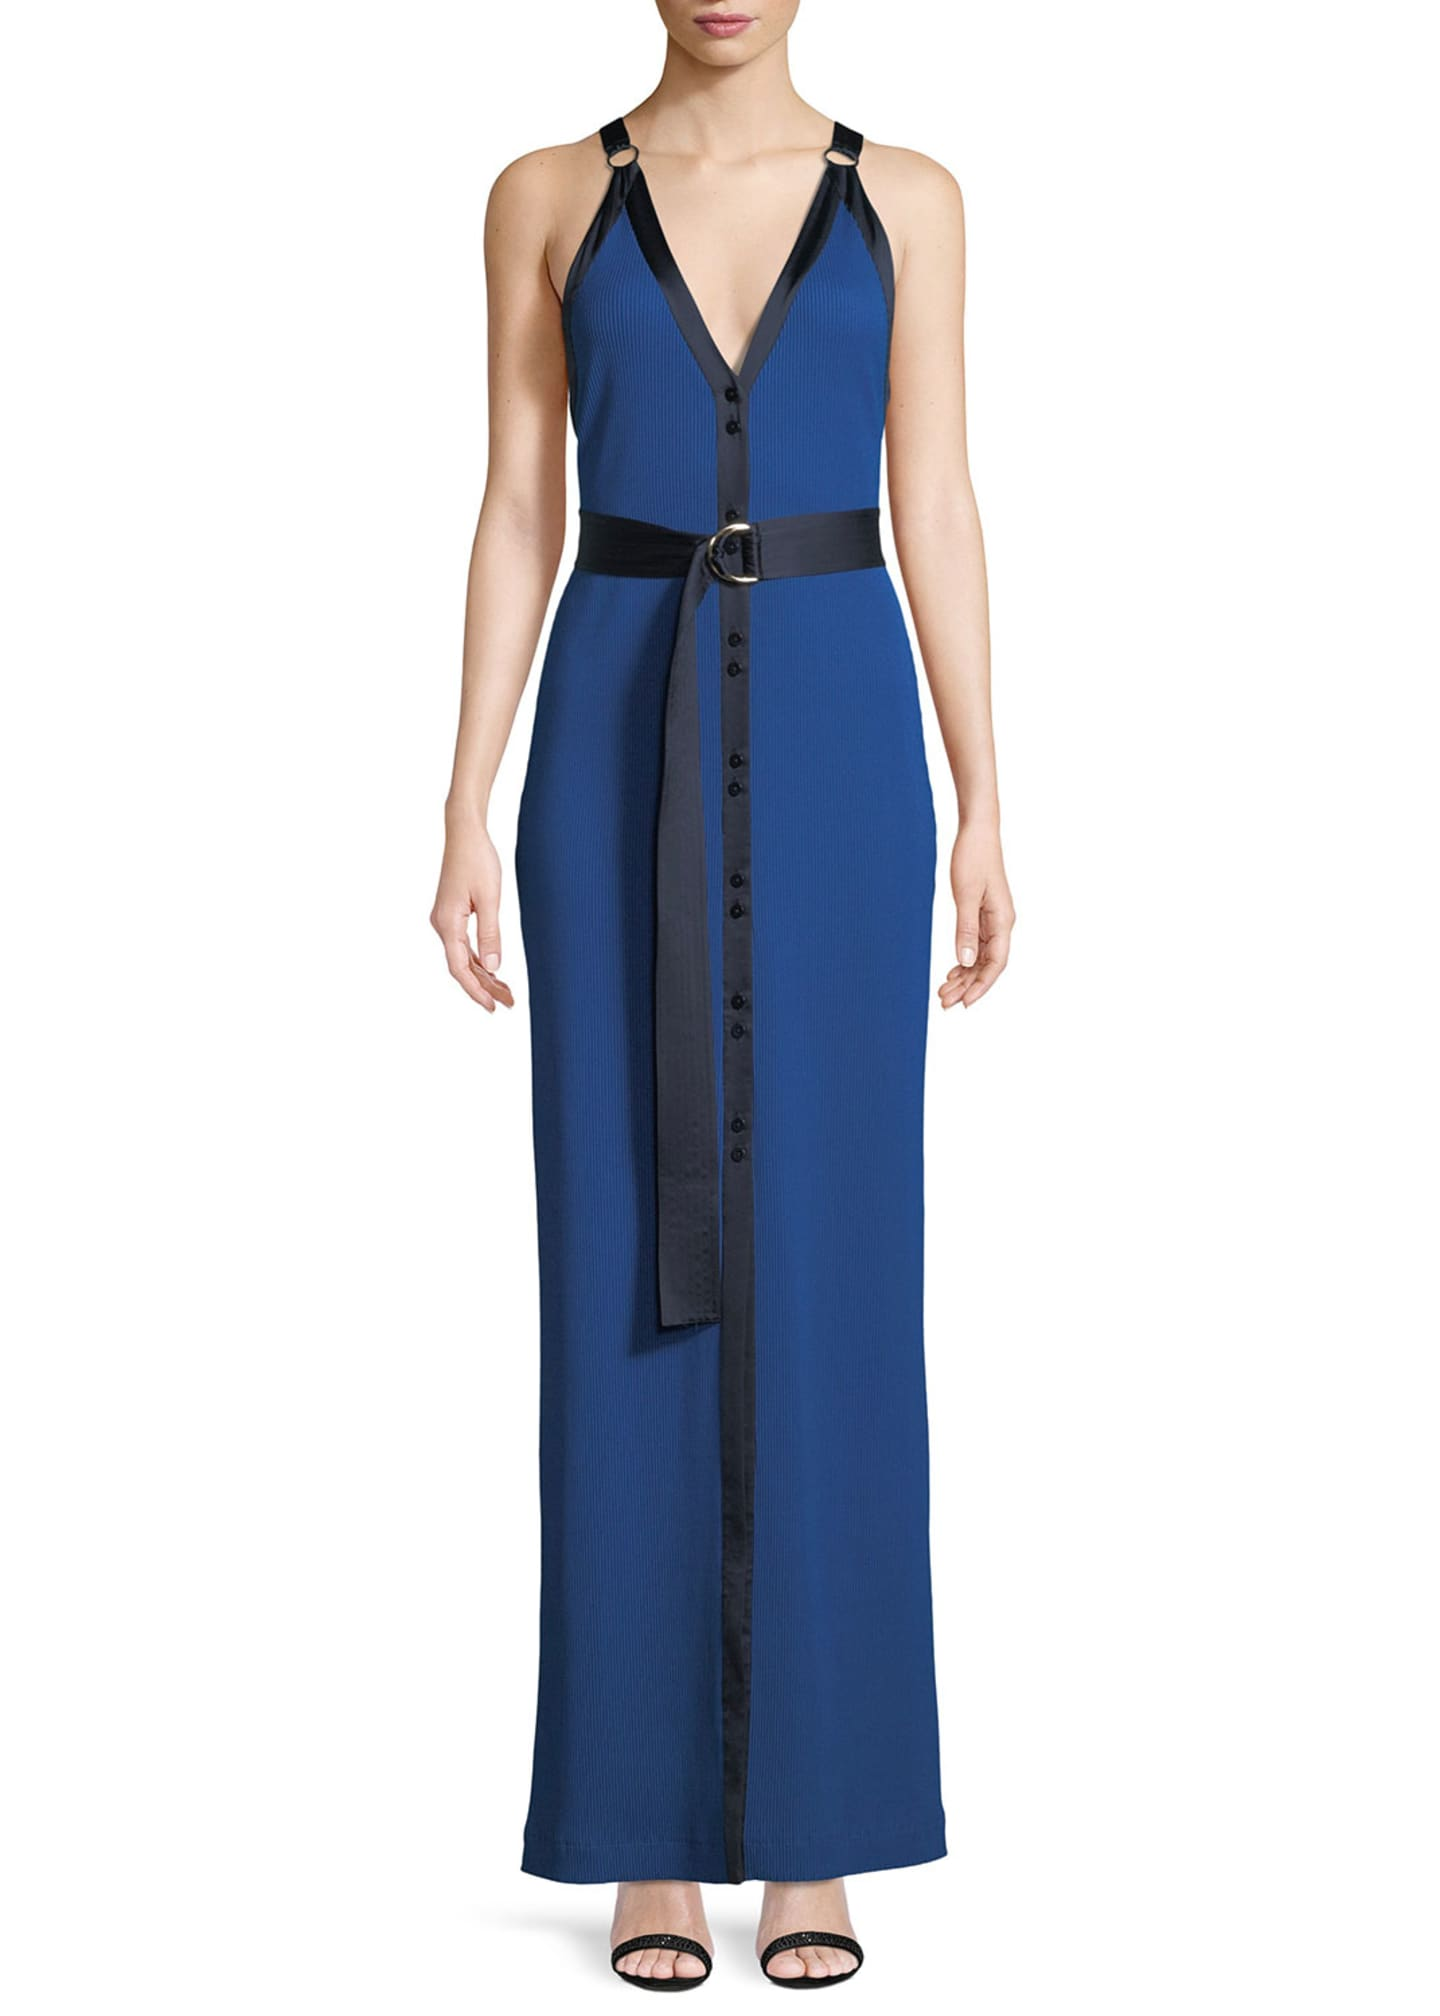 Diane von Furstenberg Sleeveless Ribbed Jersey Maxi Dress